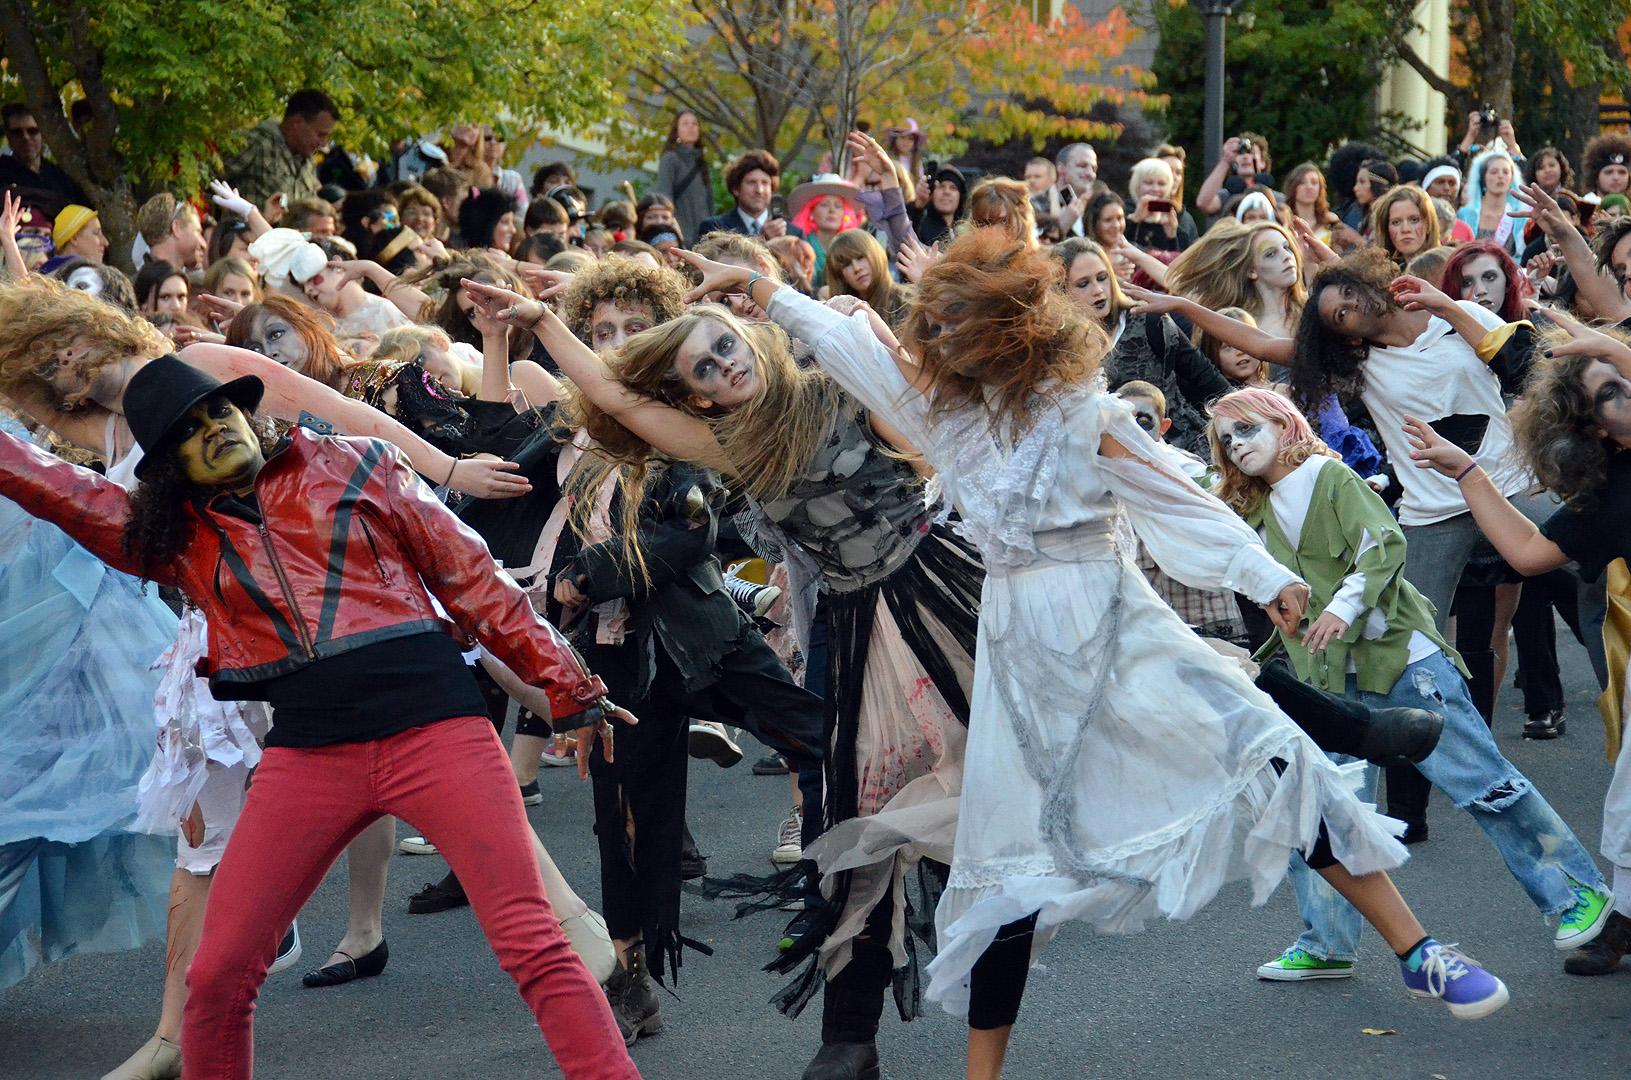 Thriller in the Ashland Halloween Parade « Ashland Daily Photo